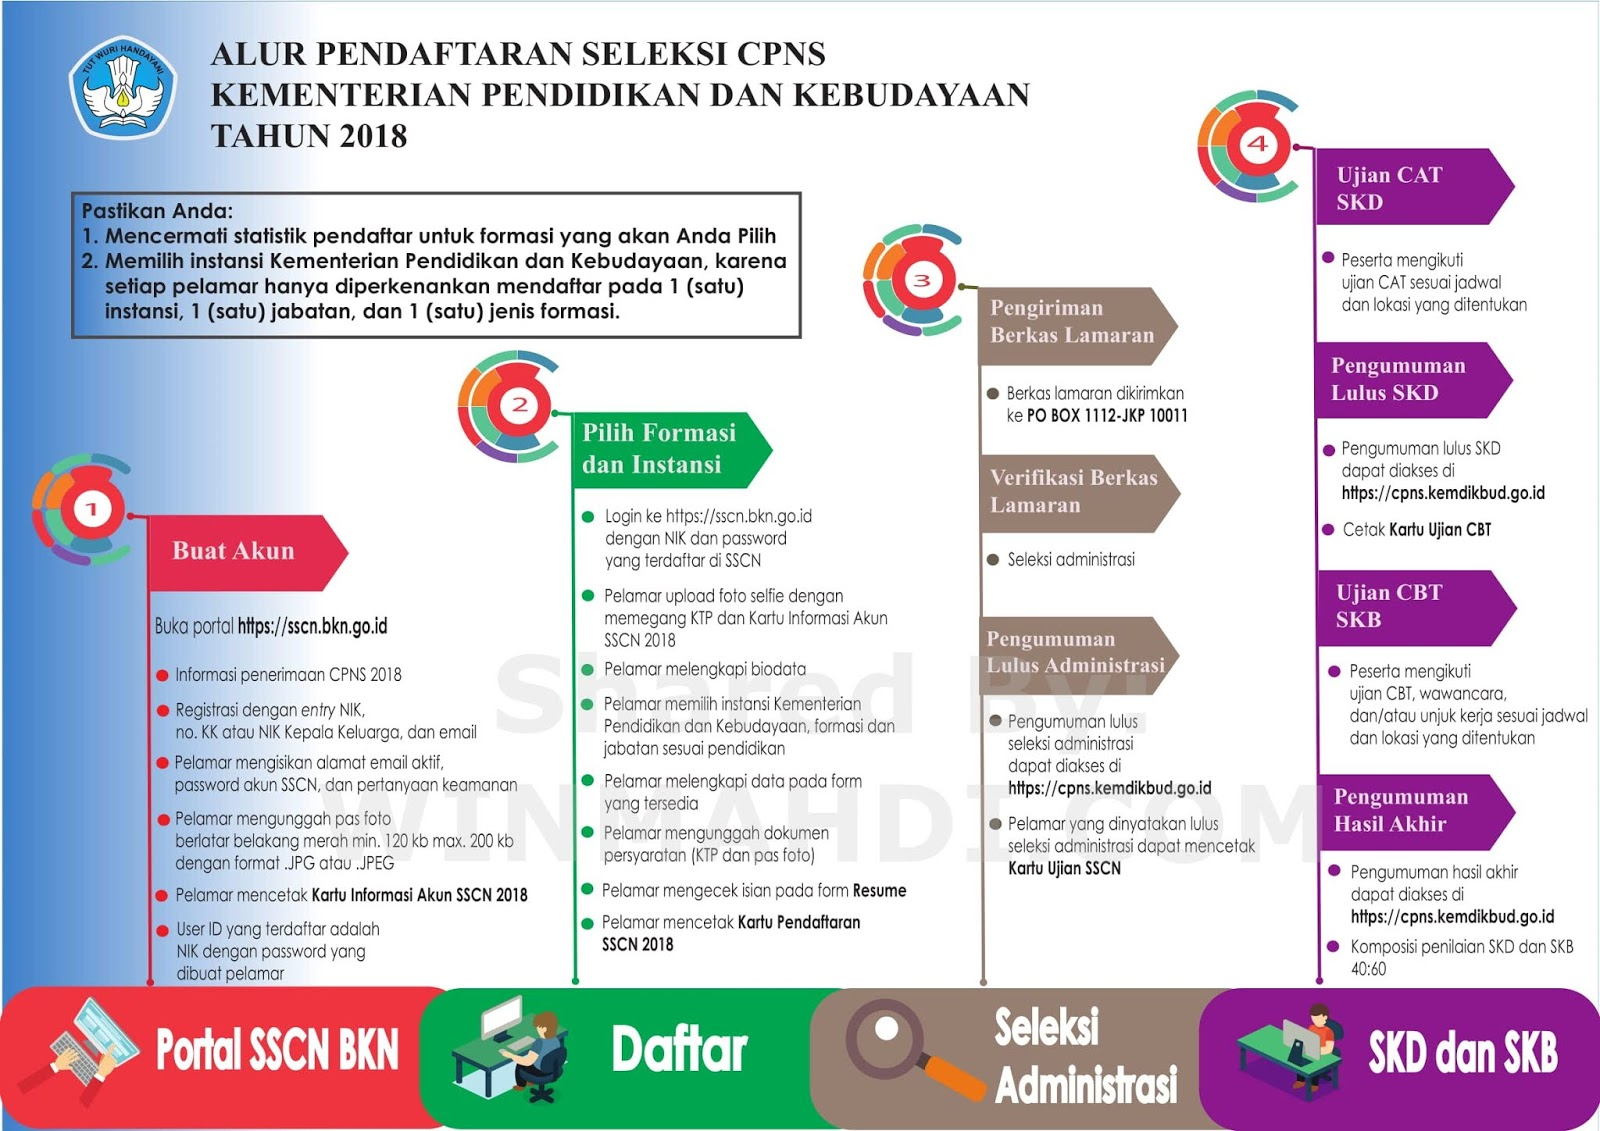 CPNS Kemendikbud